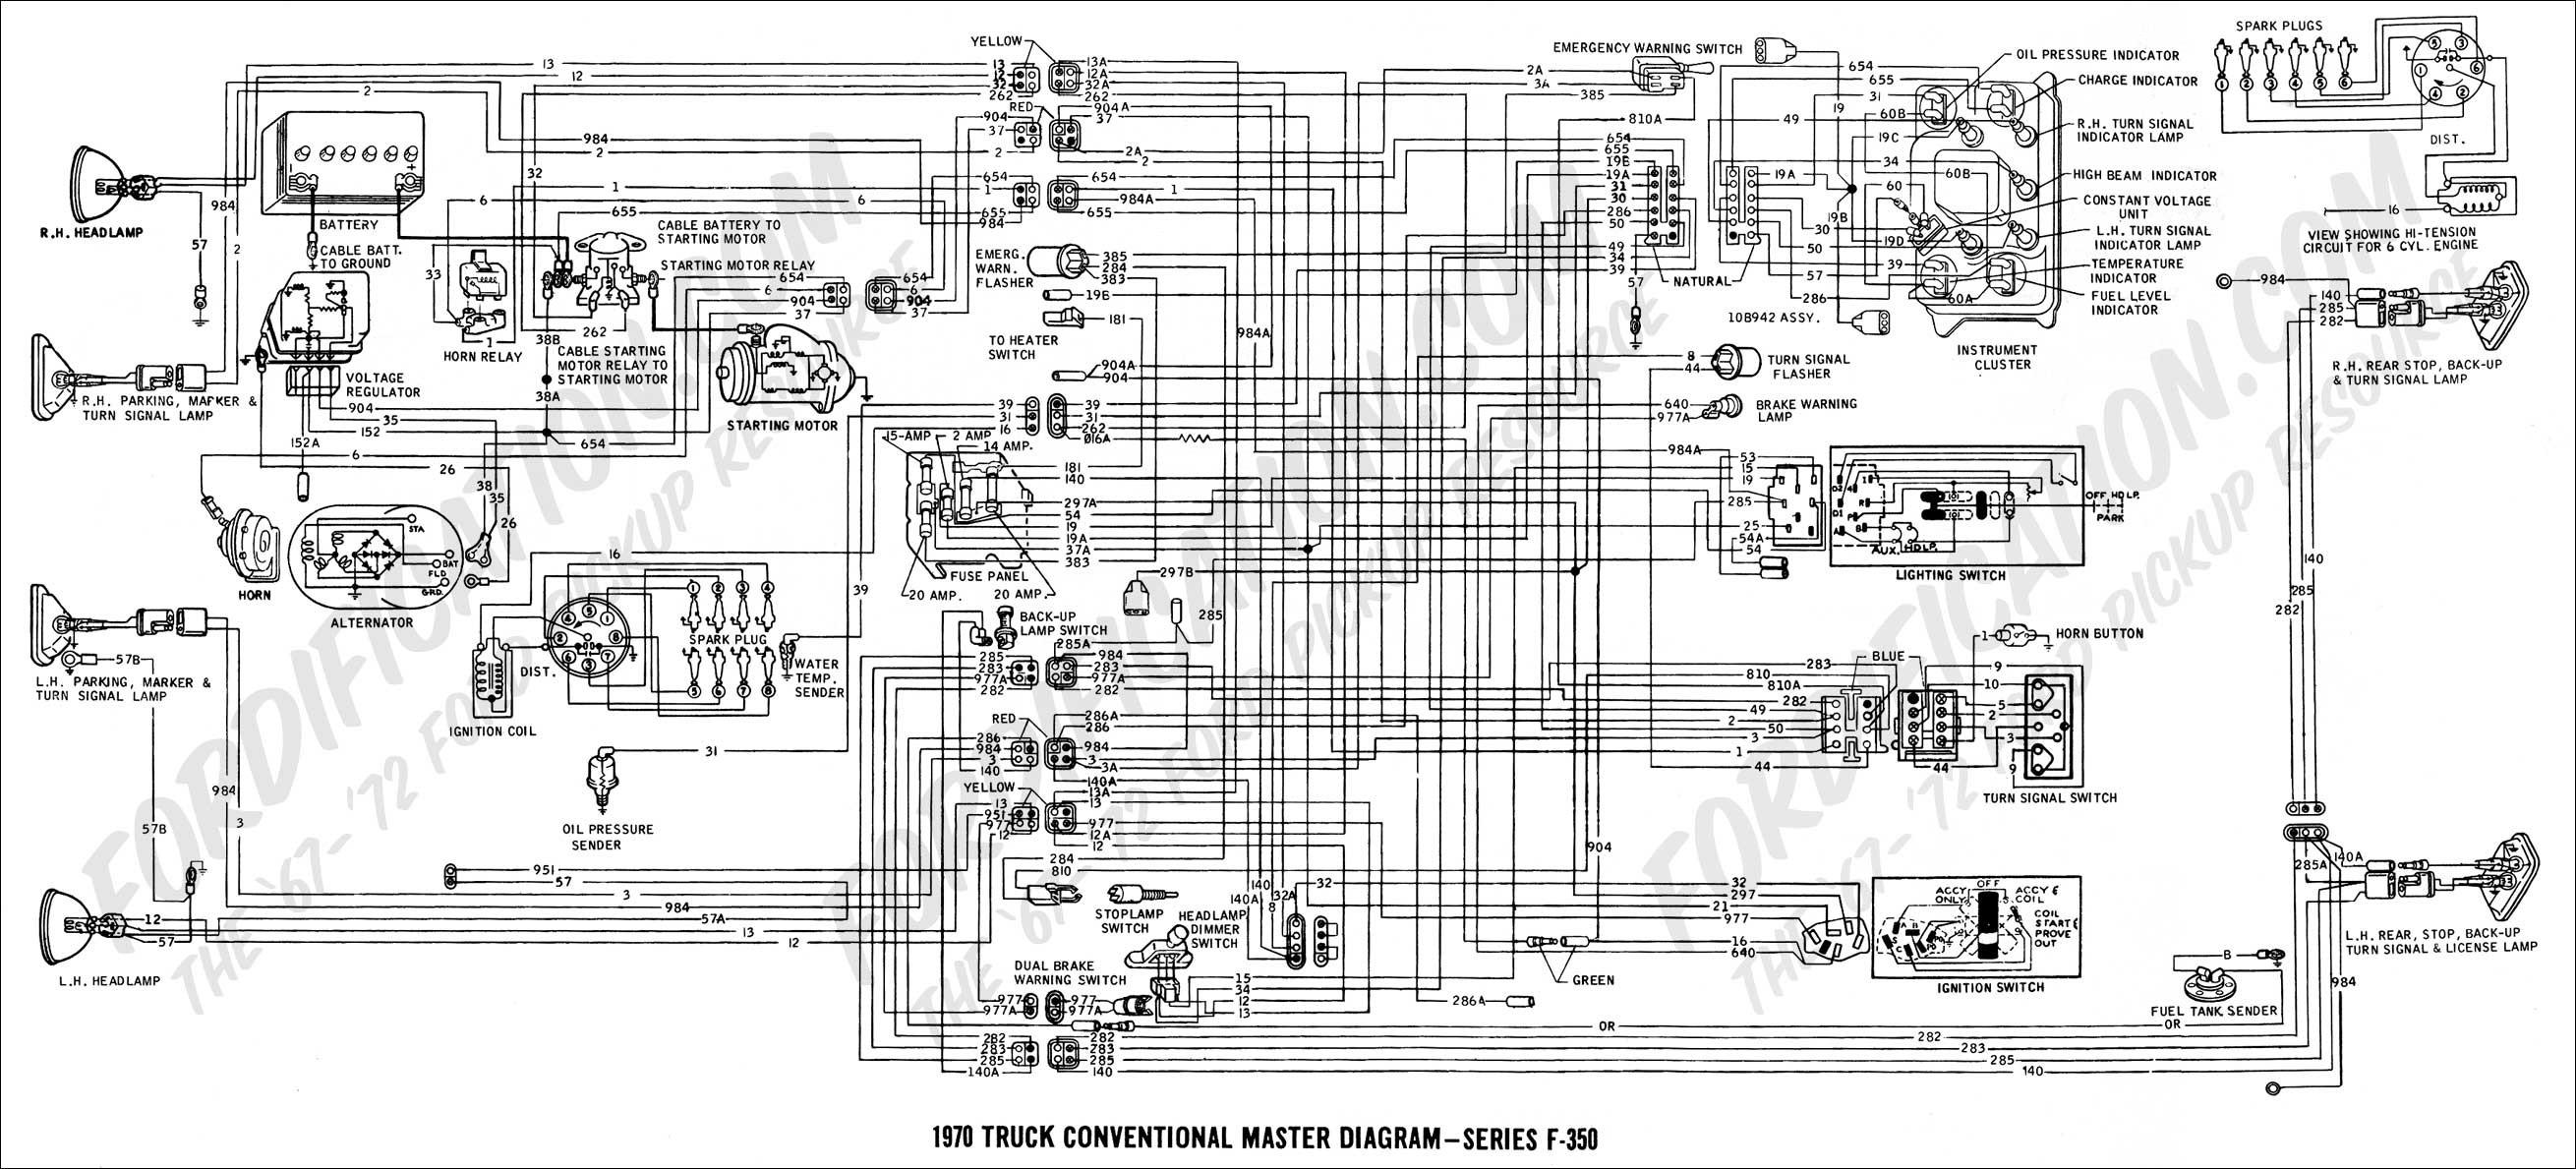 2000 Chevy Silverado Brake Light Wiring Diagram ford F350 Wiring Diagram About Wiring • Gatbook Of 2000 Chevy Silverado Brake Light Wiring Diagram